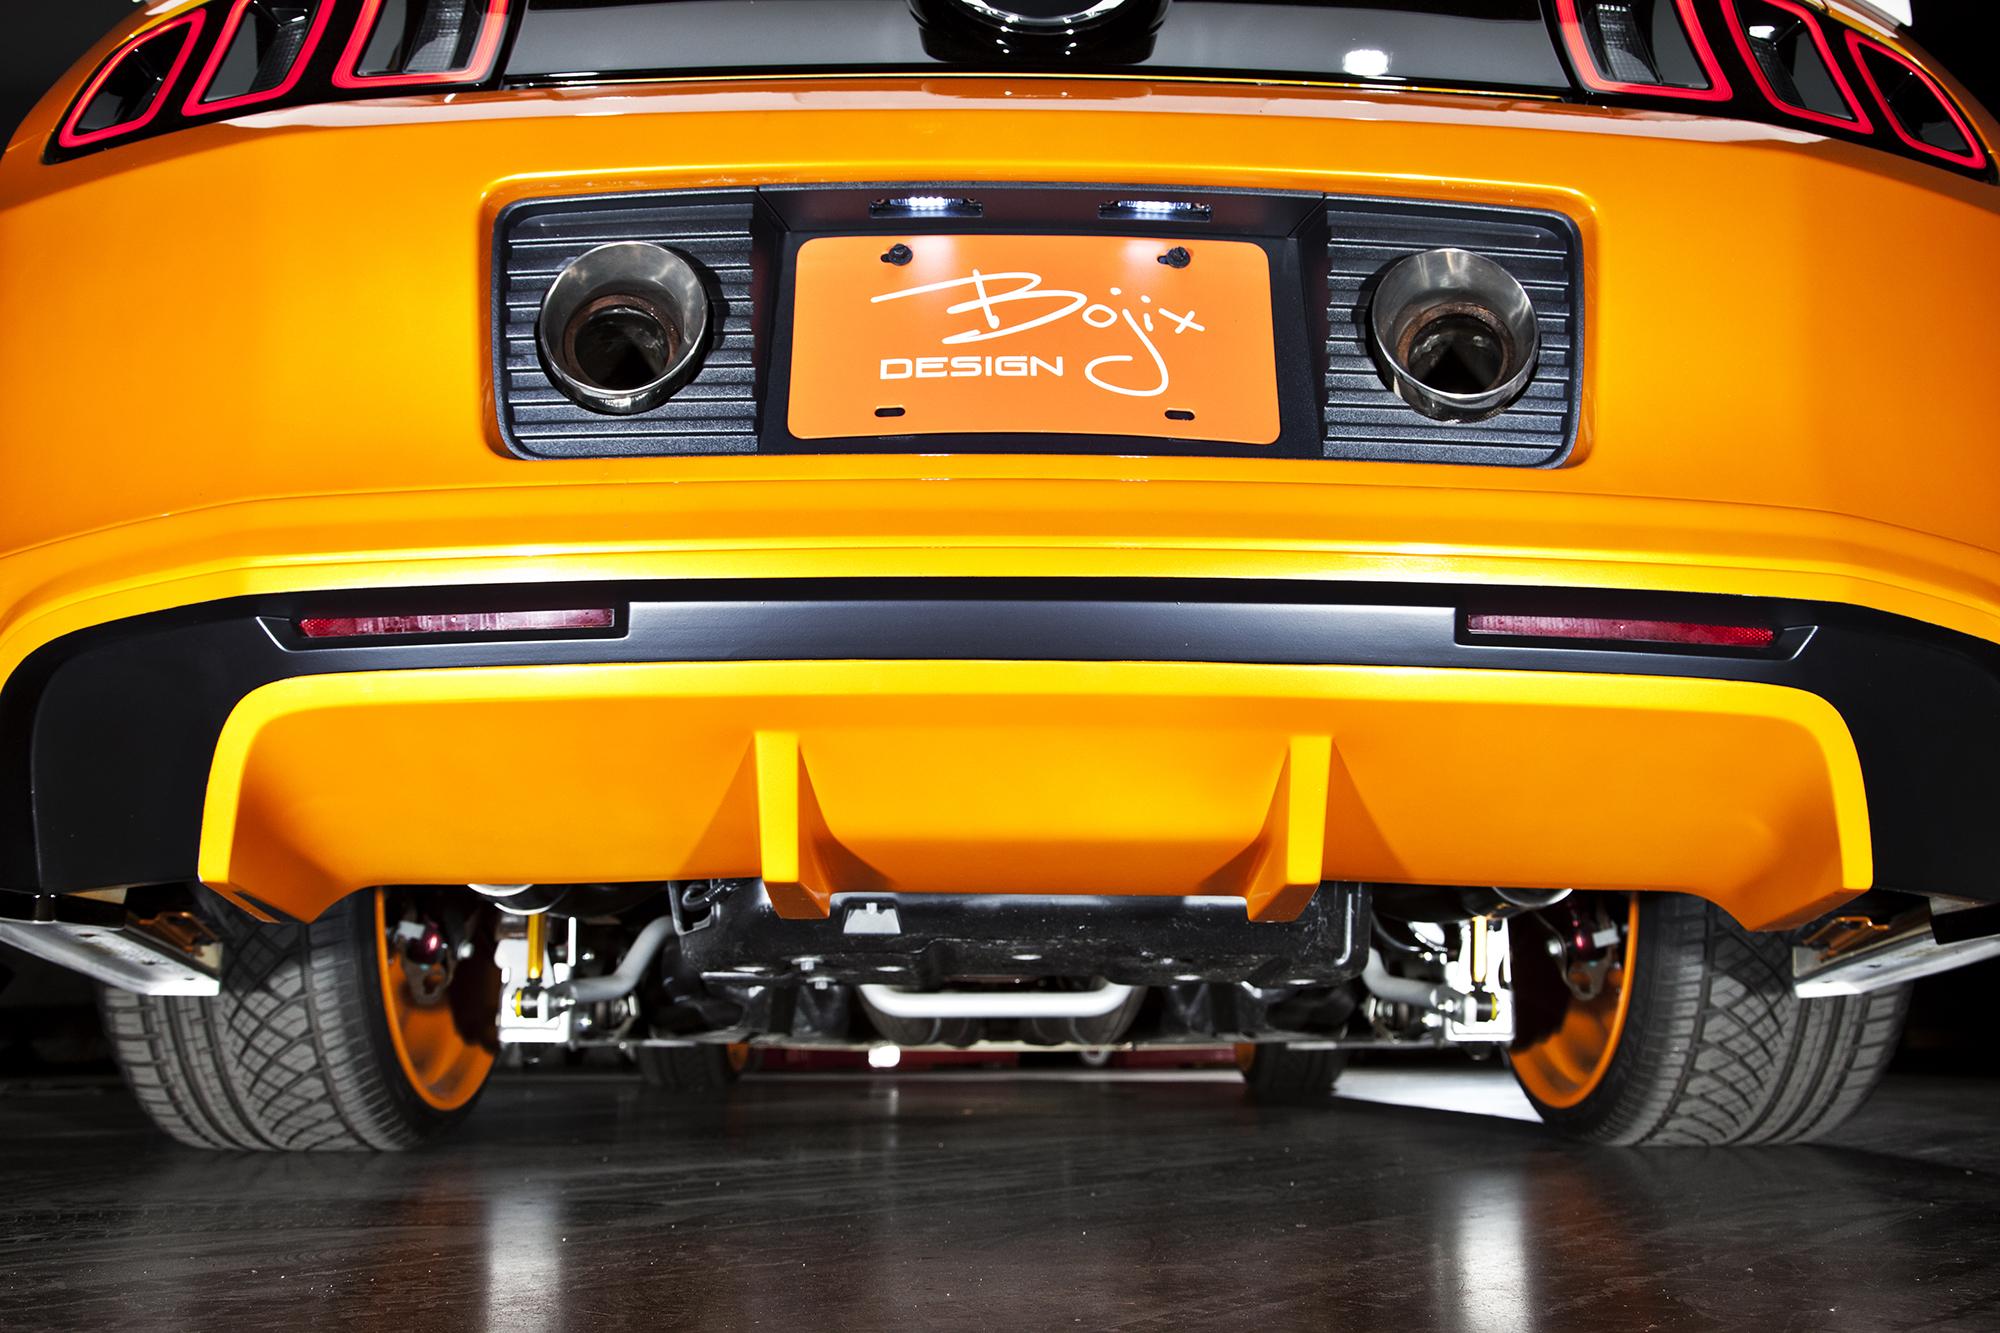 Bojix Mustang GT rear suspension